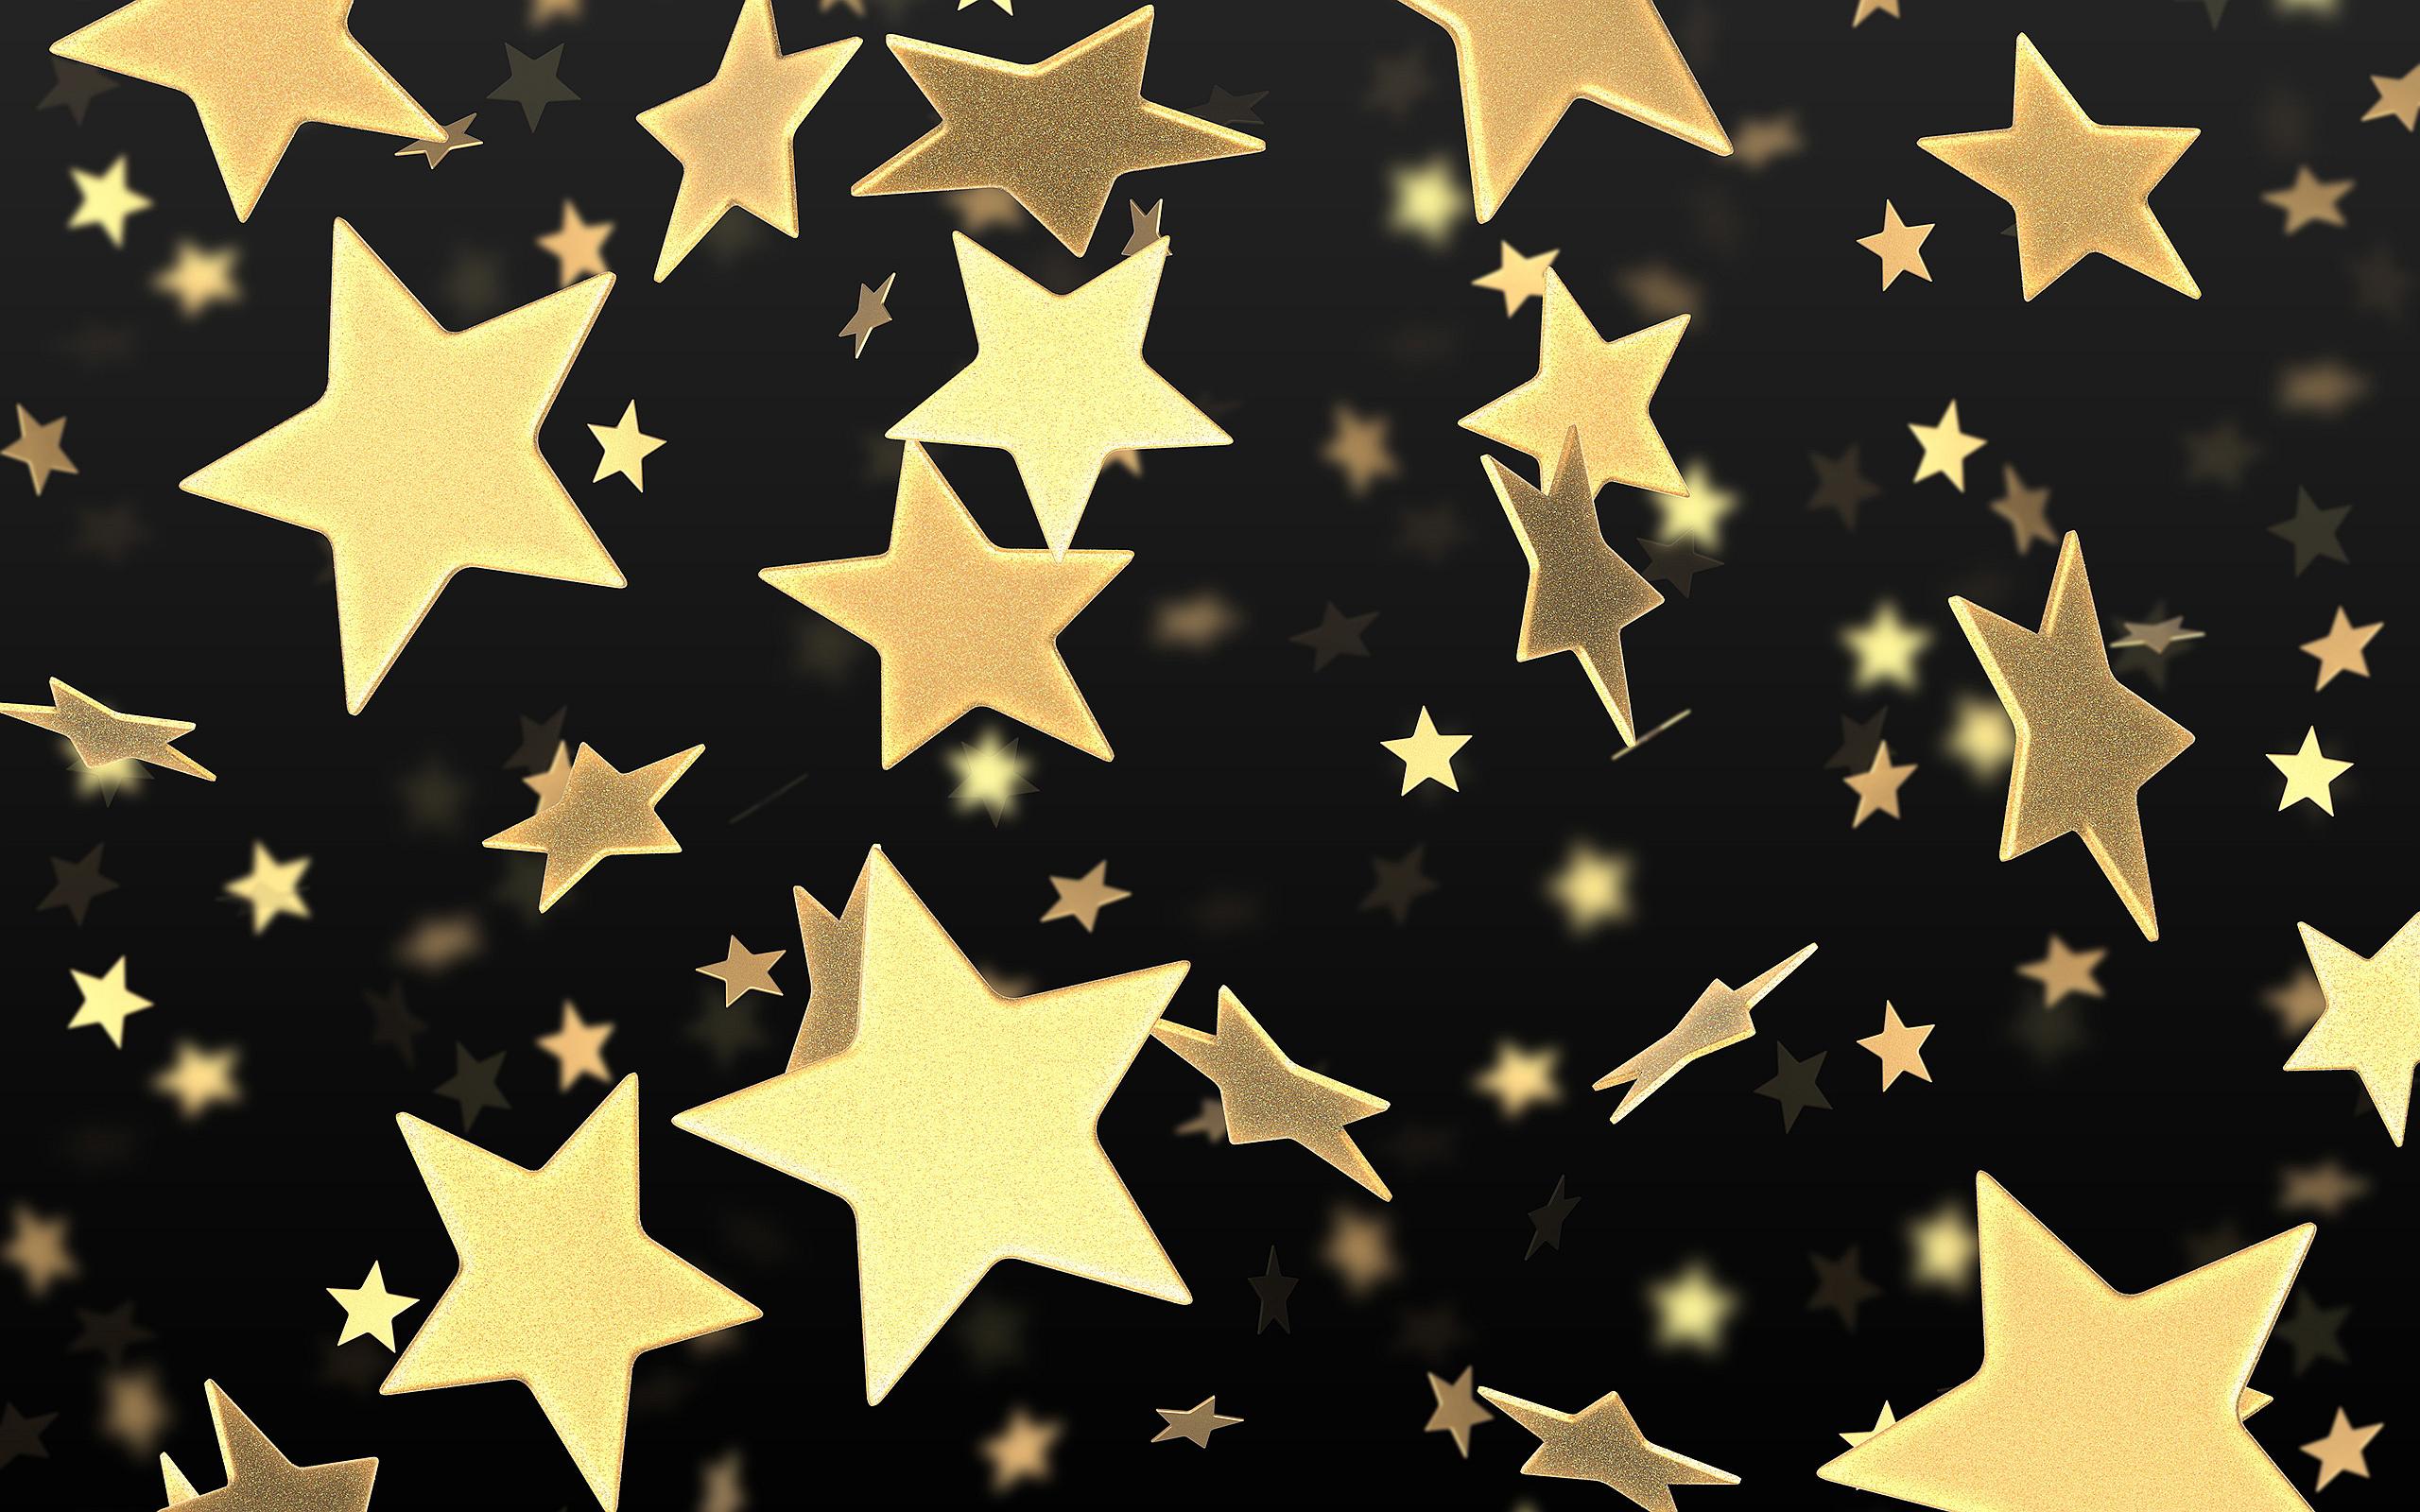 Black And Gold Wallpaper Tumblr 14 Cool Hd Wallpaper 2560x1600